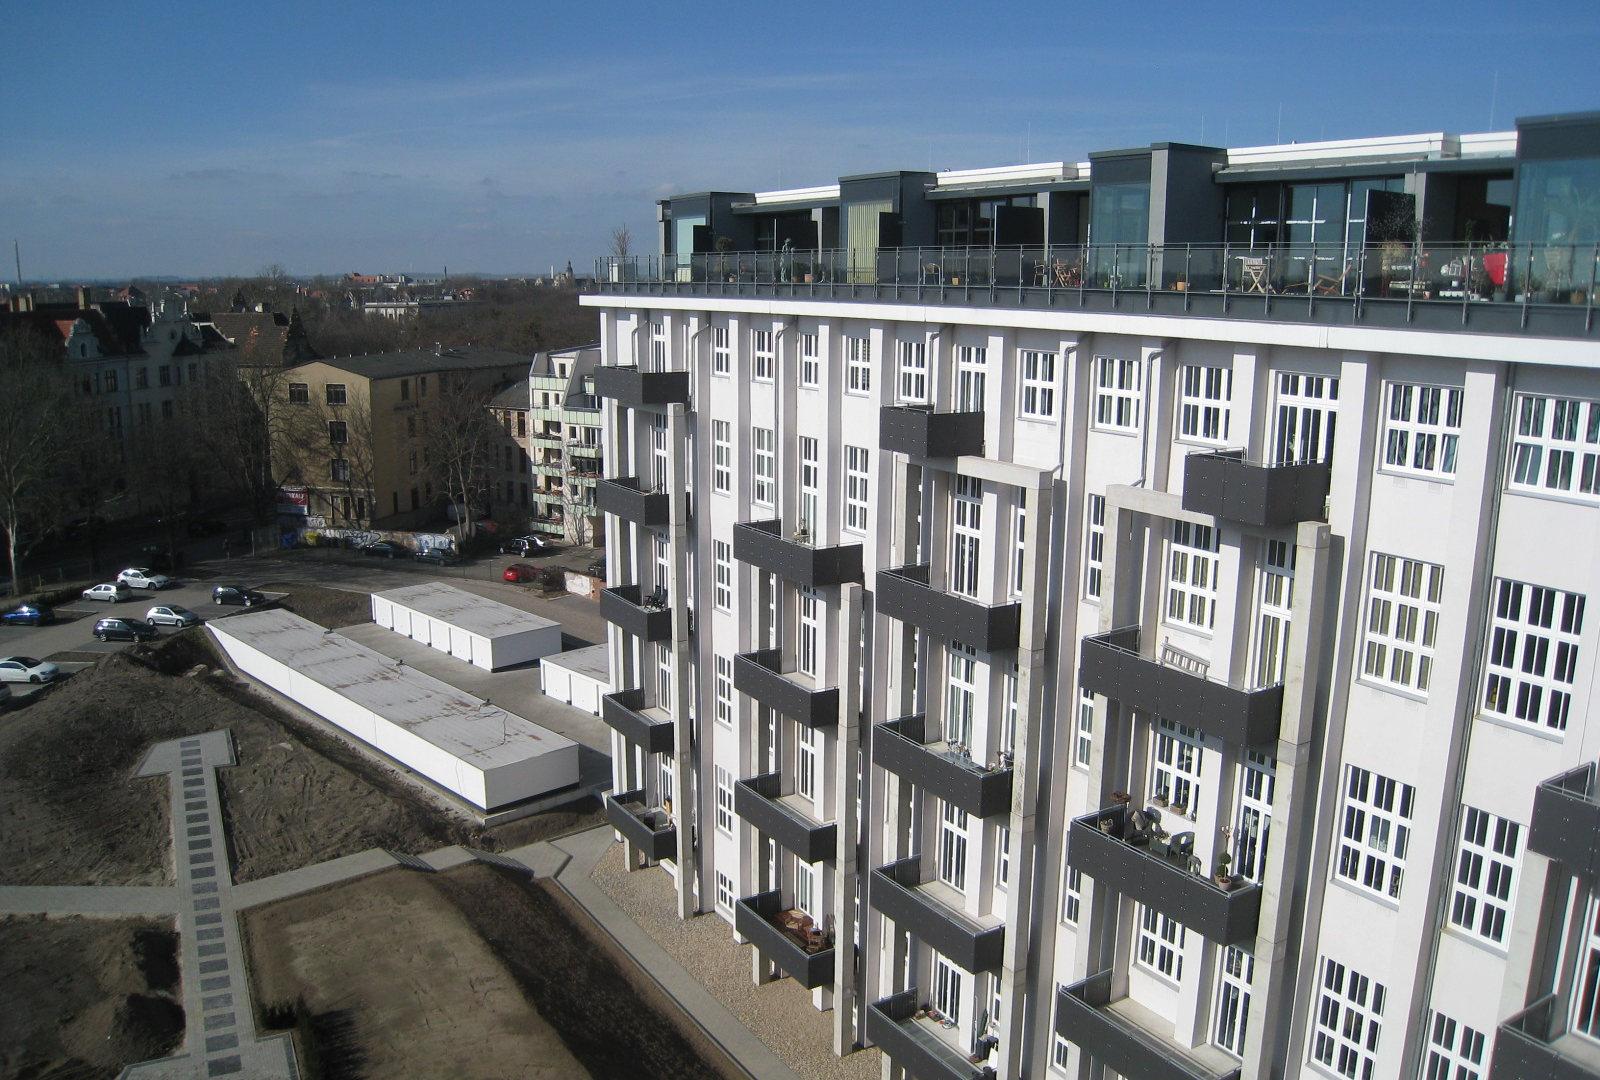 Ehem. Fabrik in Wohnungen umgebaut in 39124 Magdeburg